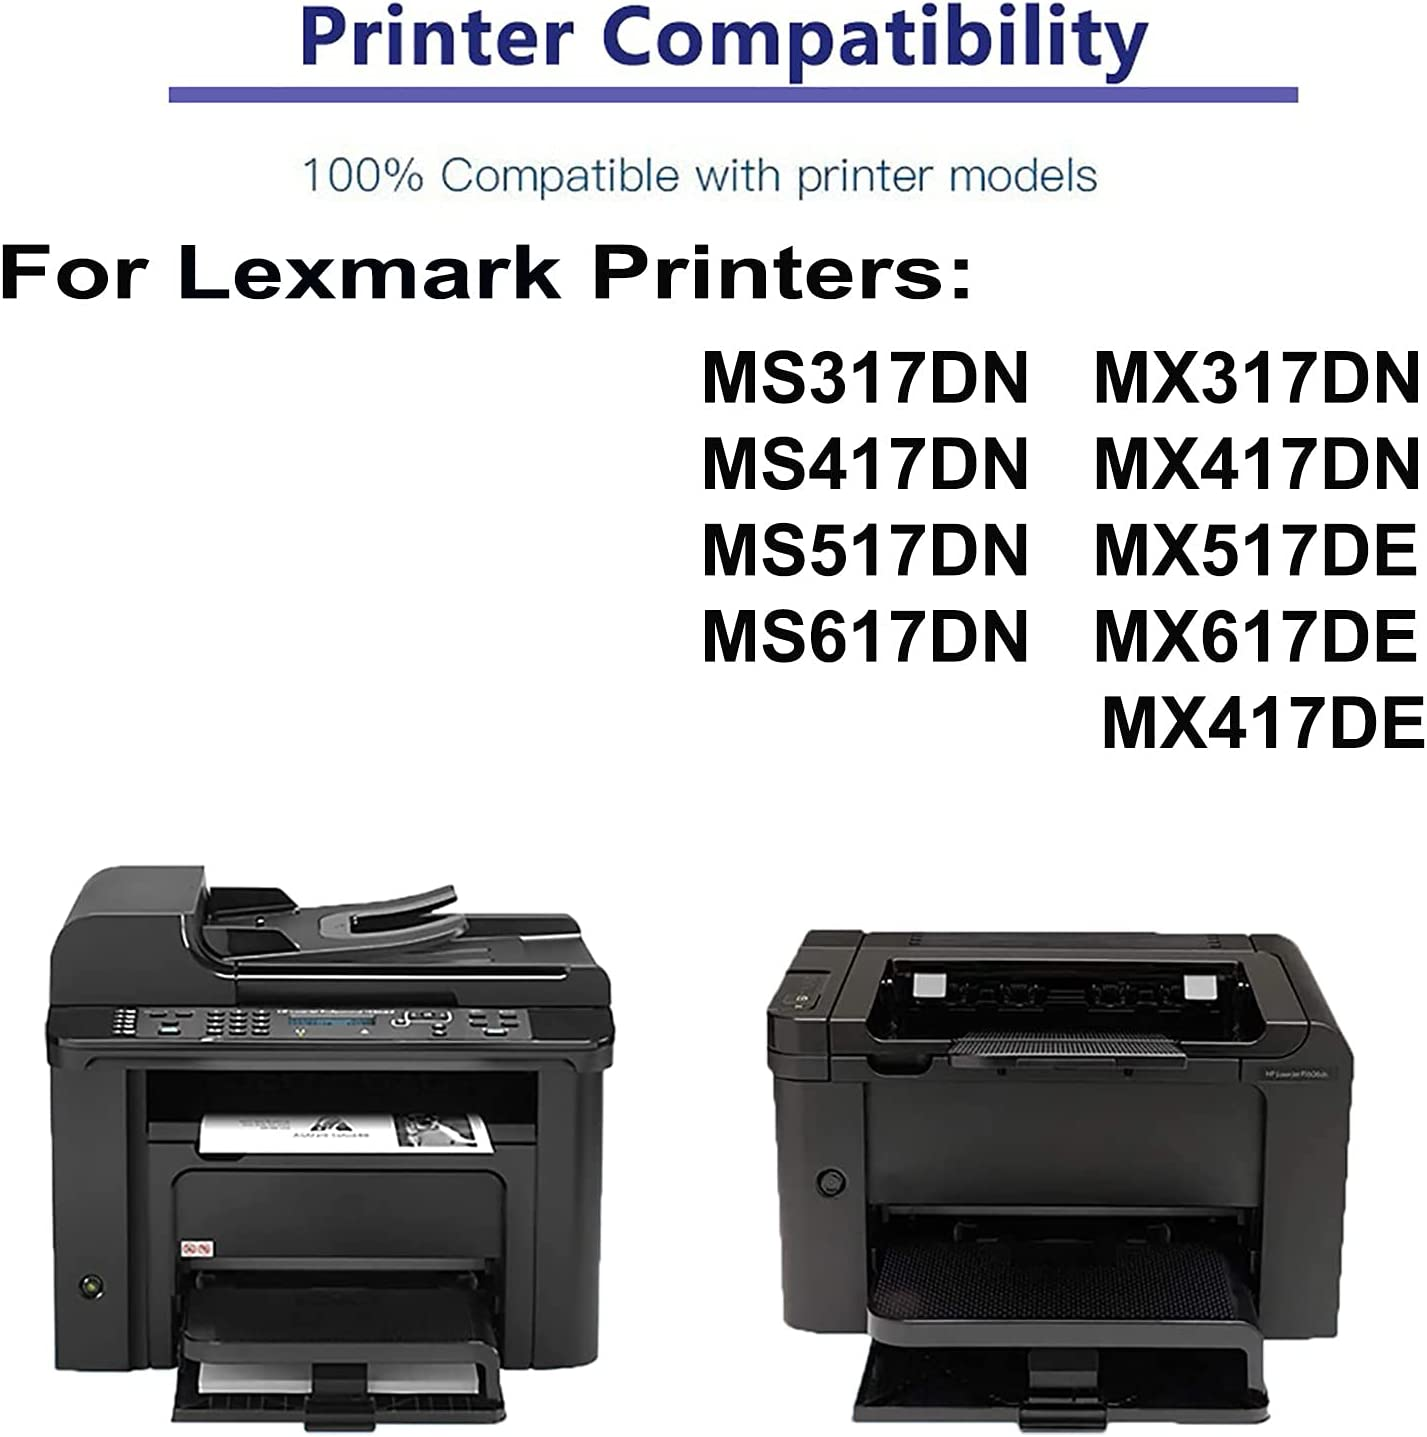 2-Pack Compatible High Capacity MX517DE MX617DE MX417DE Printer Toner Cartridge Replacement for Lexmark 52B2H00 Printer Cartridge (Black)